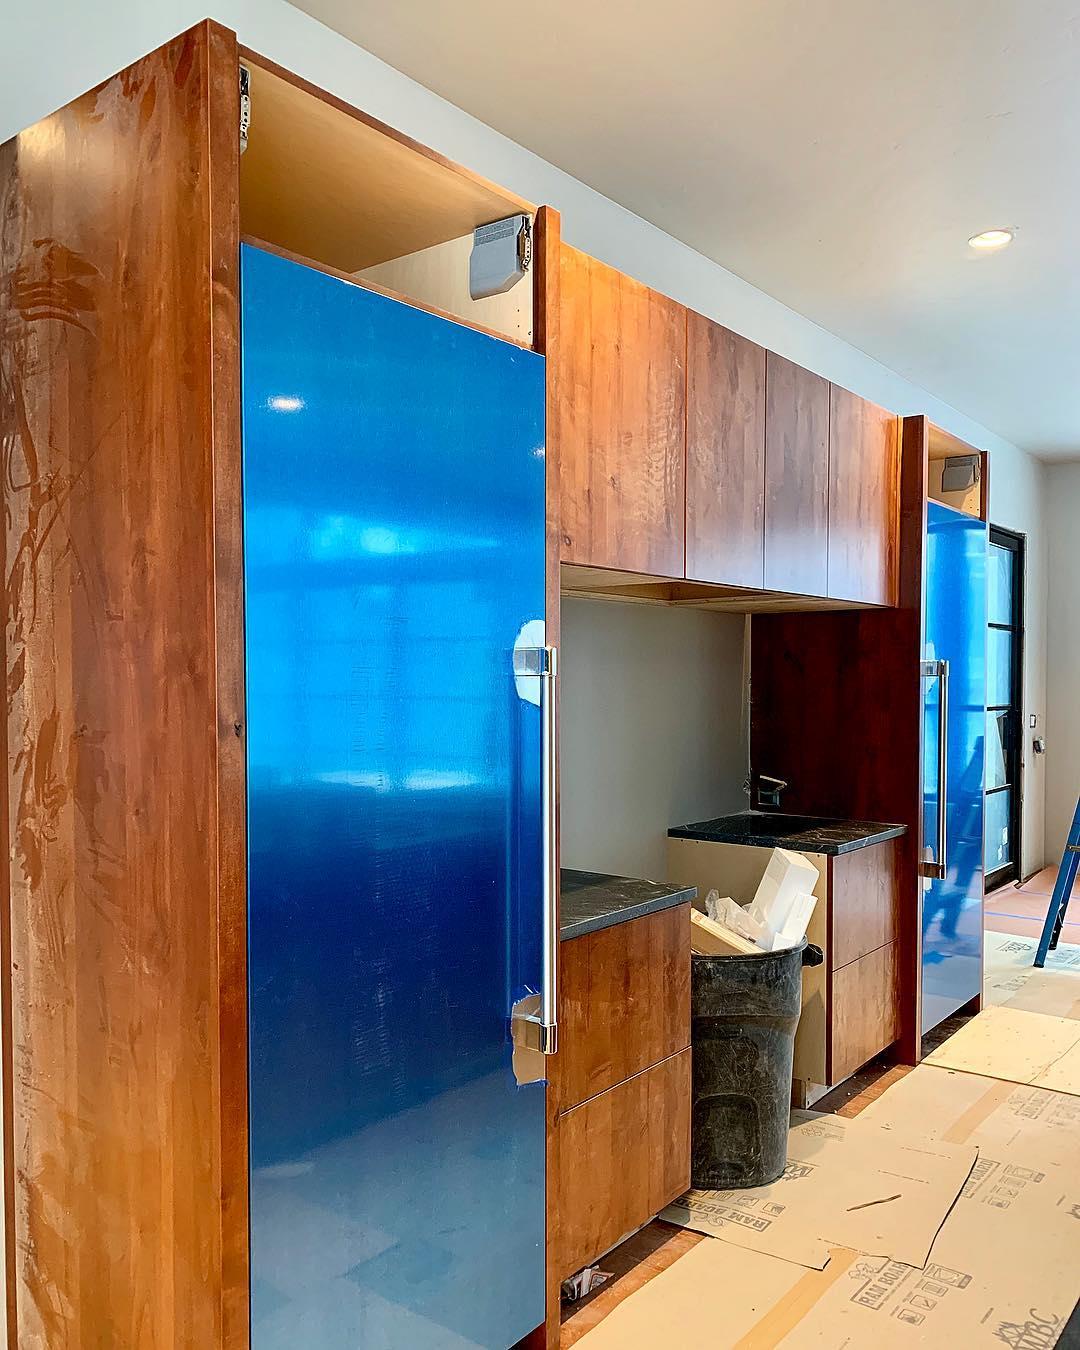 Sort of liking the look of the big blue fridge!! whitefish custom home builder